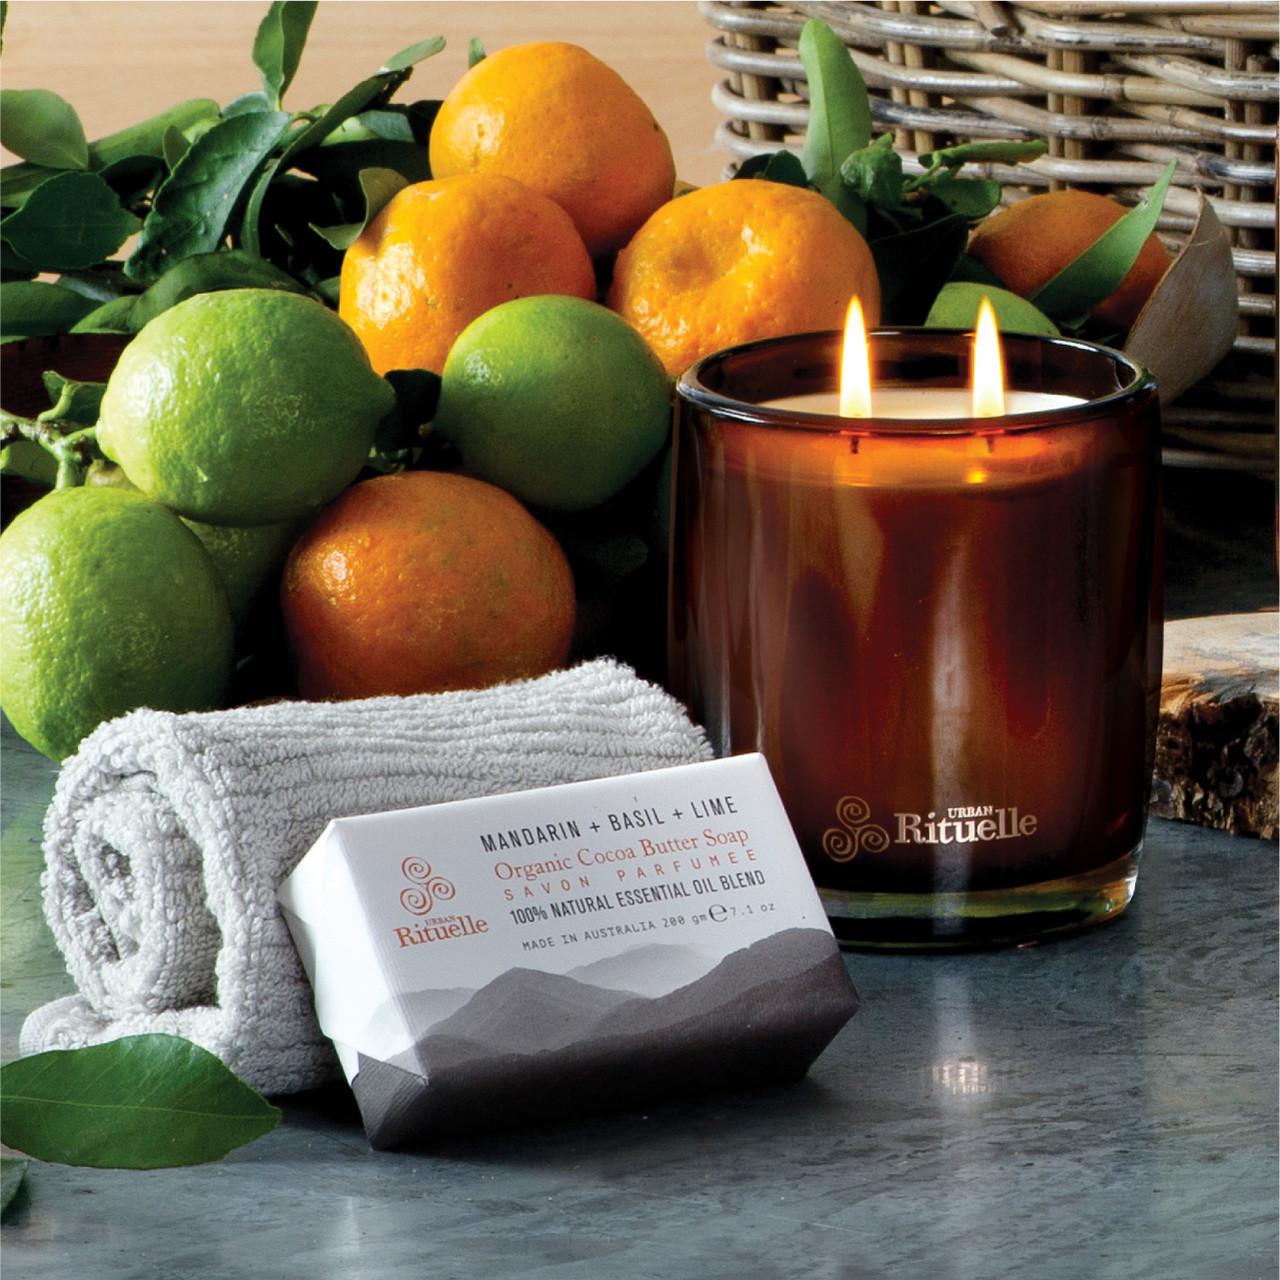 Equilibrium - Organic Cocoa Butter Soap - Mandarin, Basil & Lime - Urban Rituelle